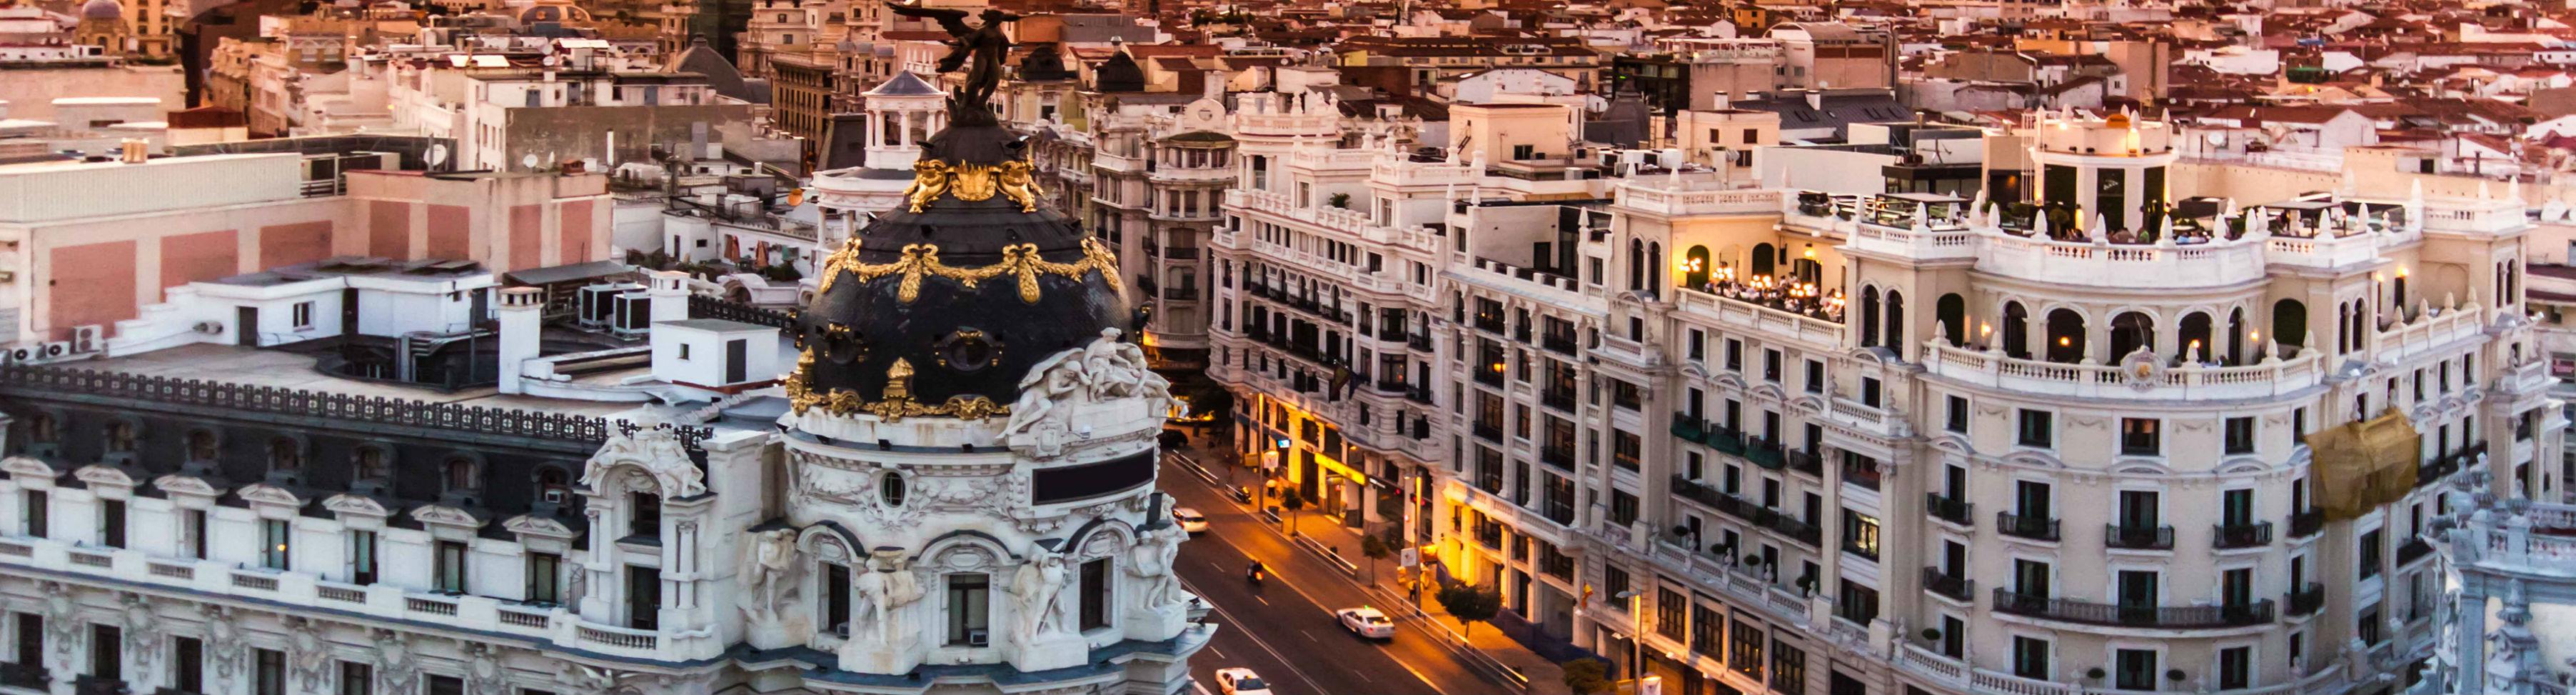 MADRID PRVI MAJ I USKRS AVIONOM